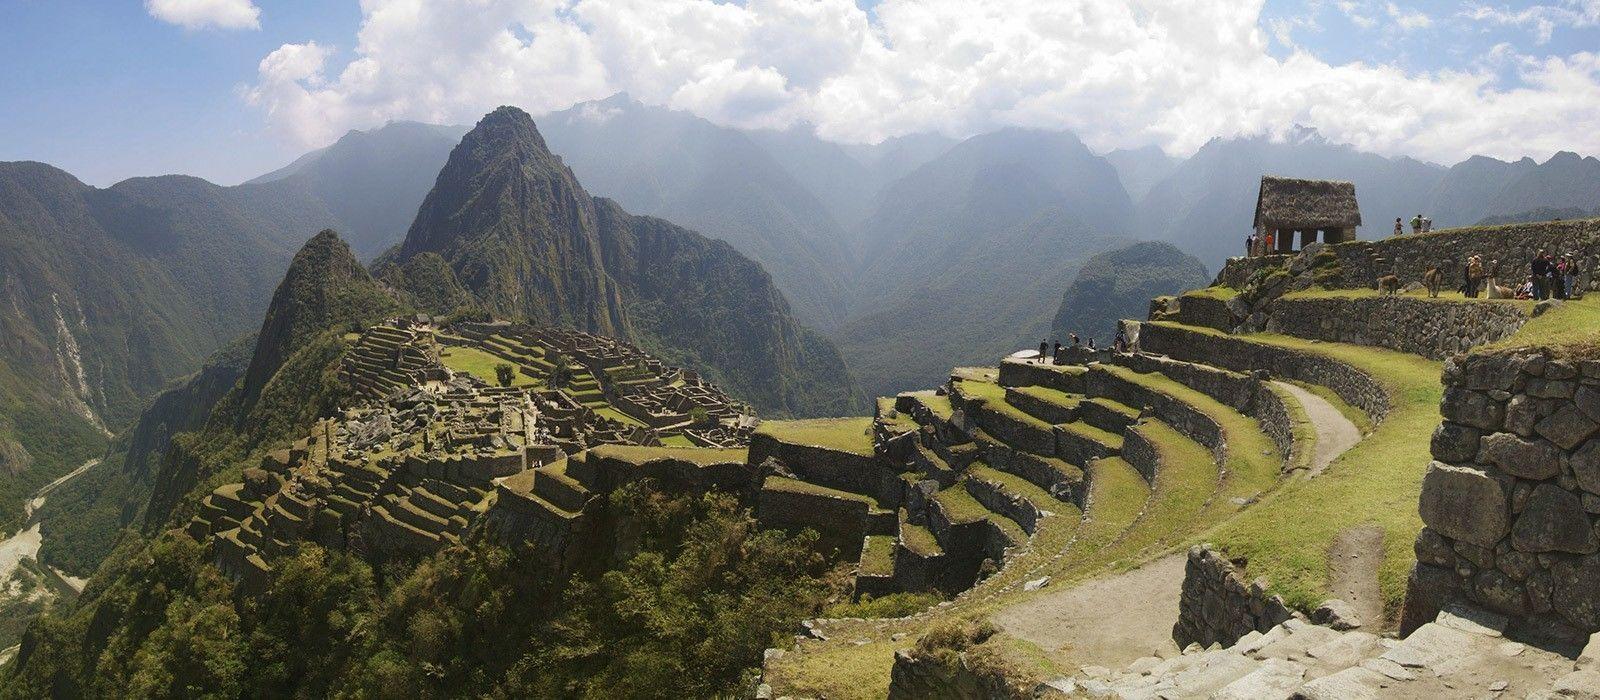 Peru: Highlights of the South Tour Trip 4